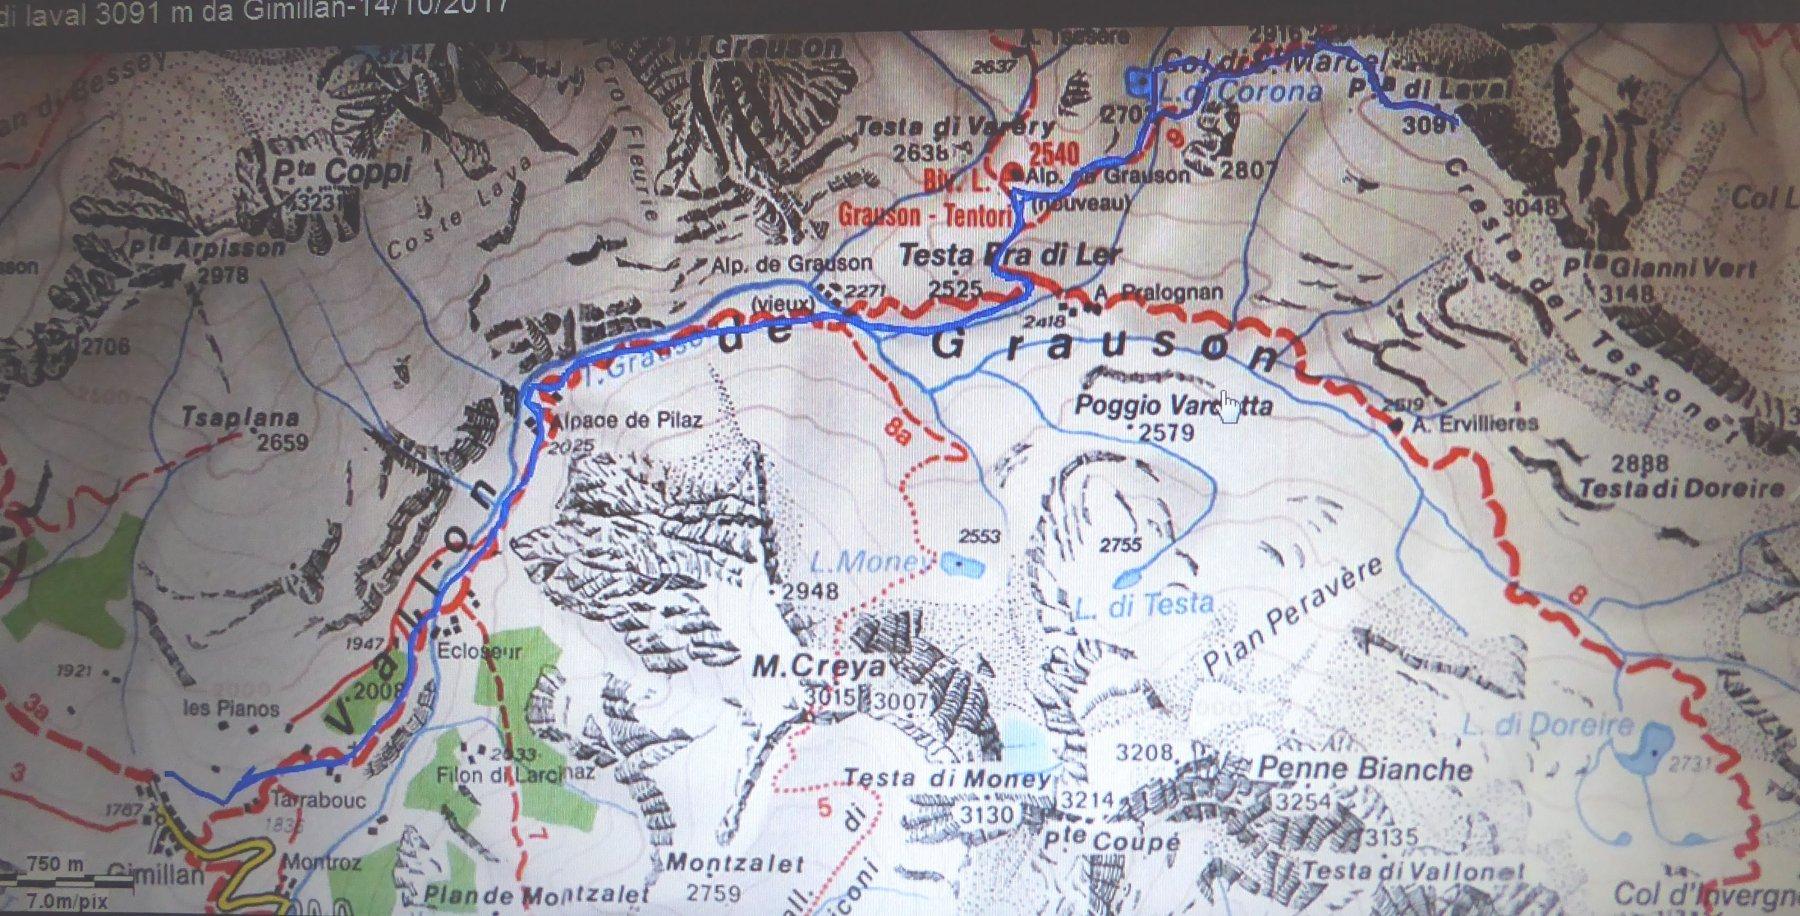 cartina e traccia gps